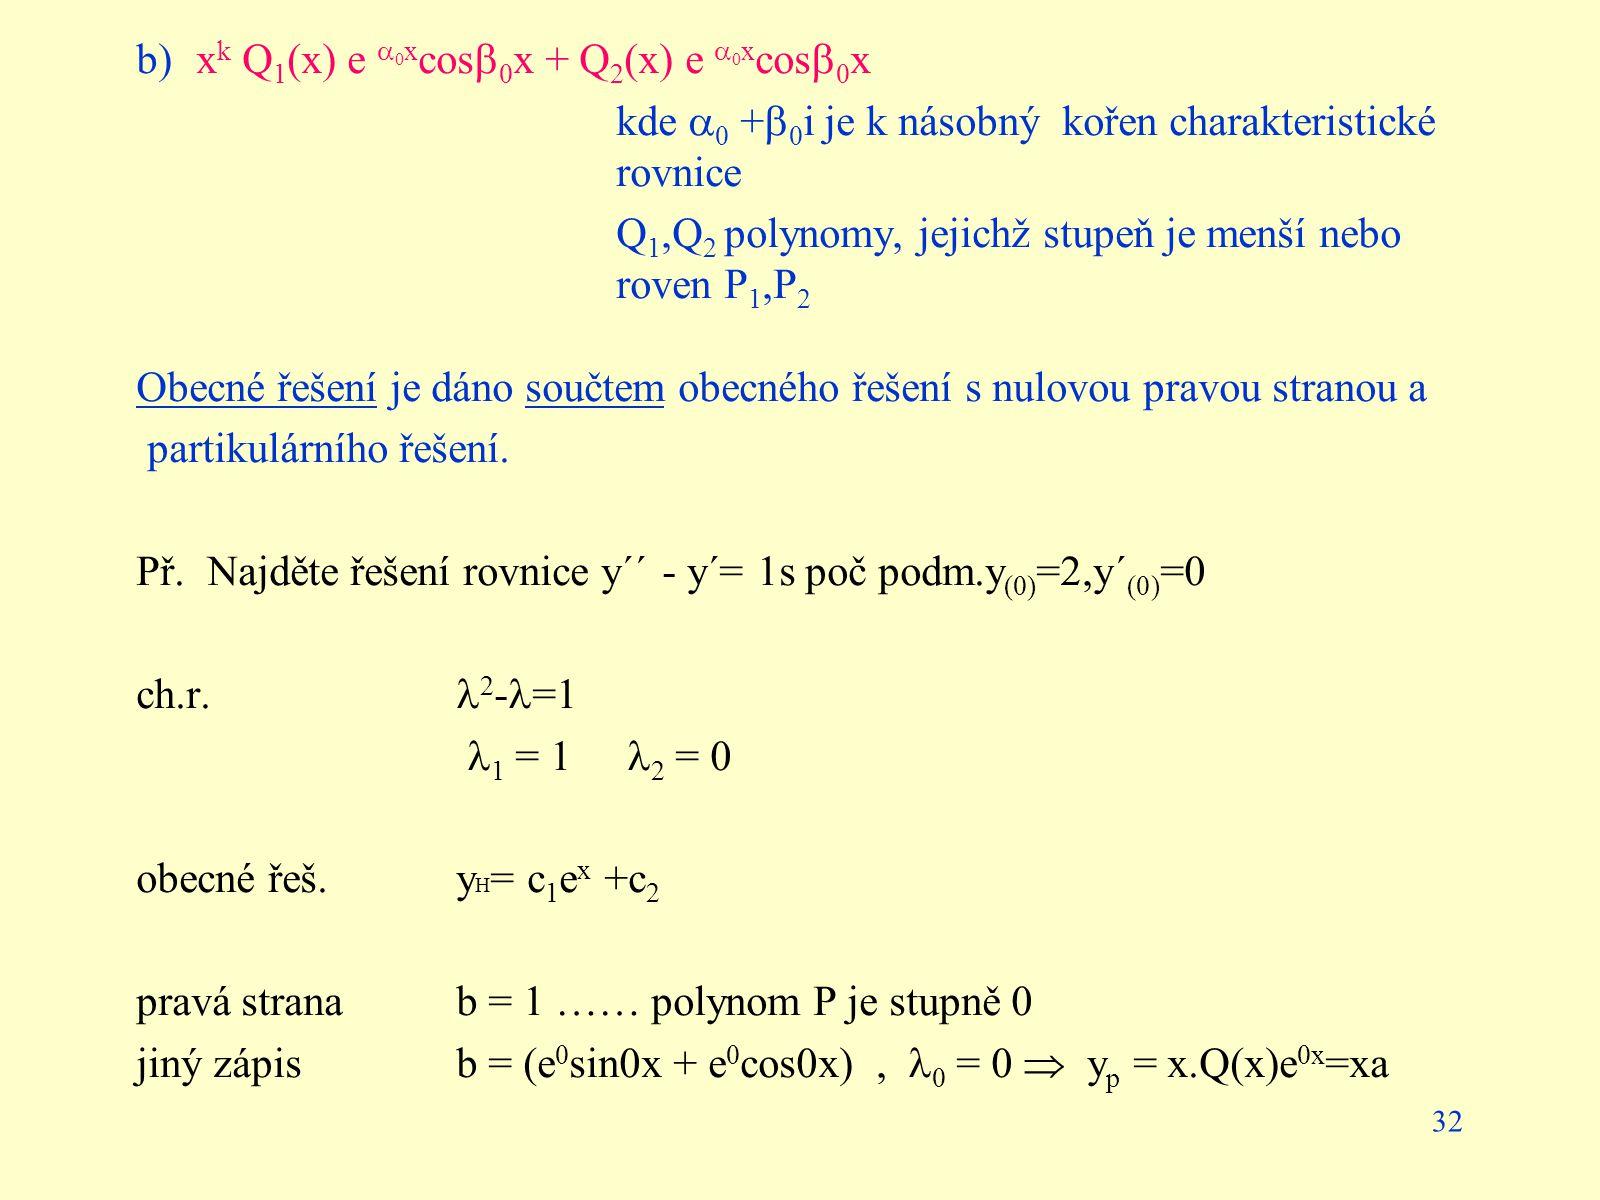 b) xk Q1(x) e 0xcos0x + Q2(x) e 0xcos0x